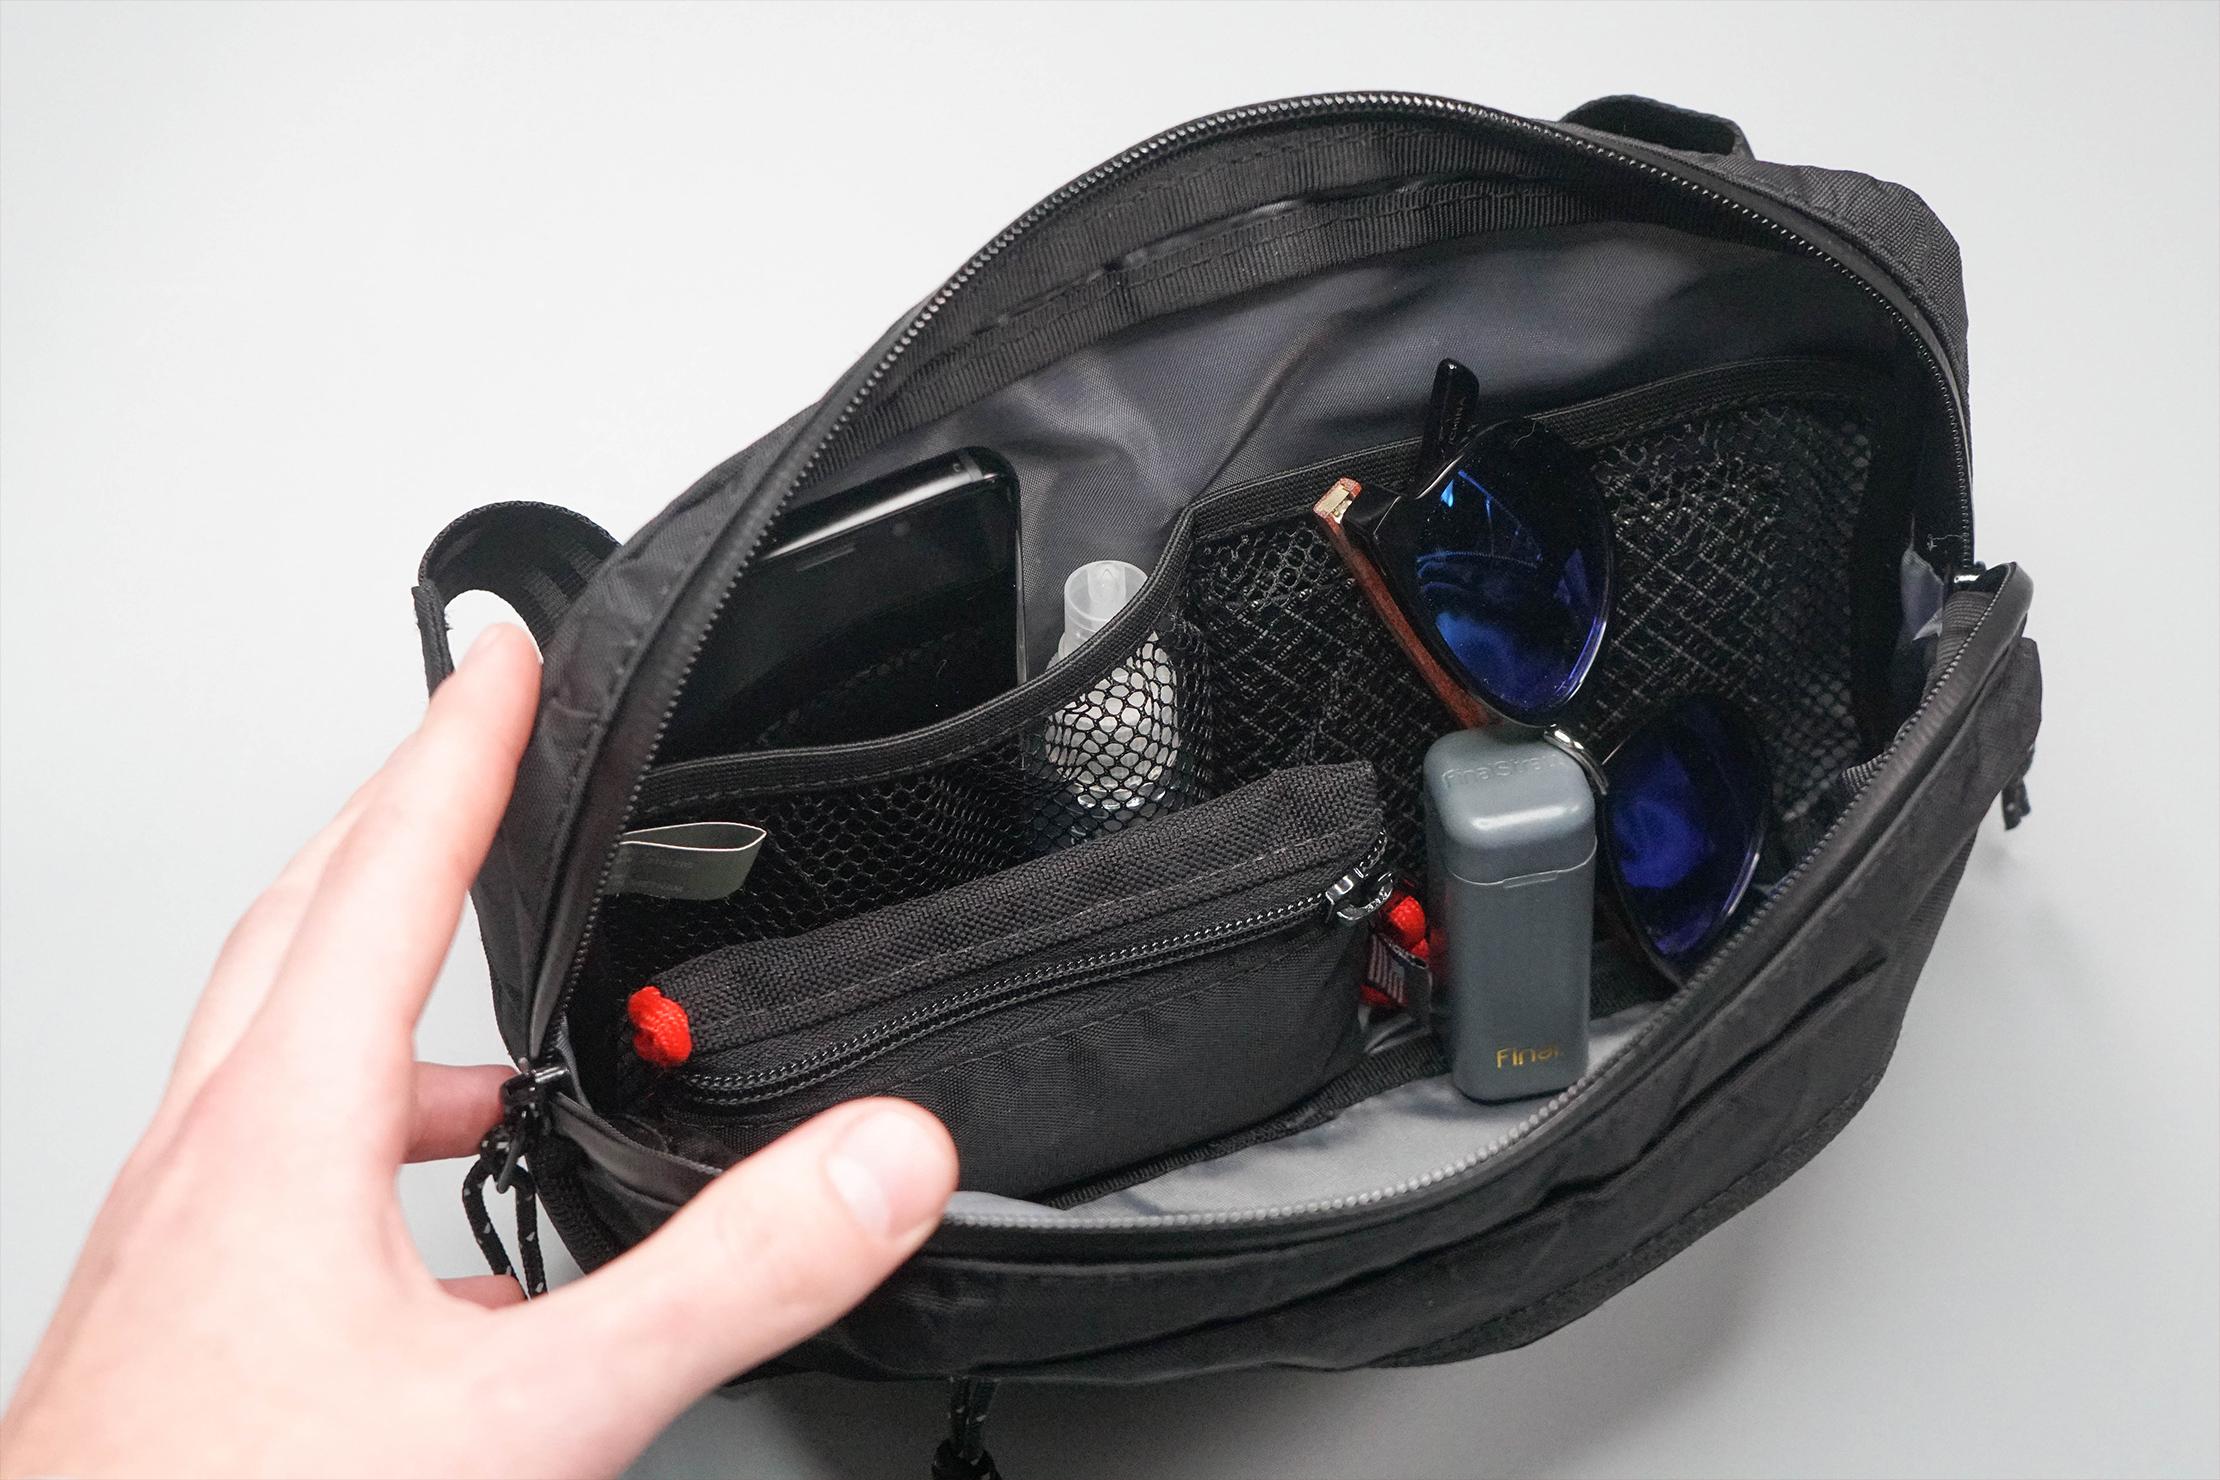 Chrome Industries Ziptop Waistpack Main Compartment